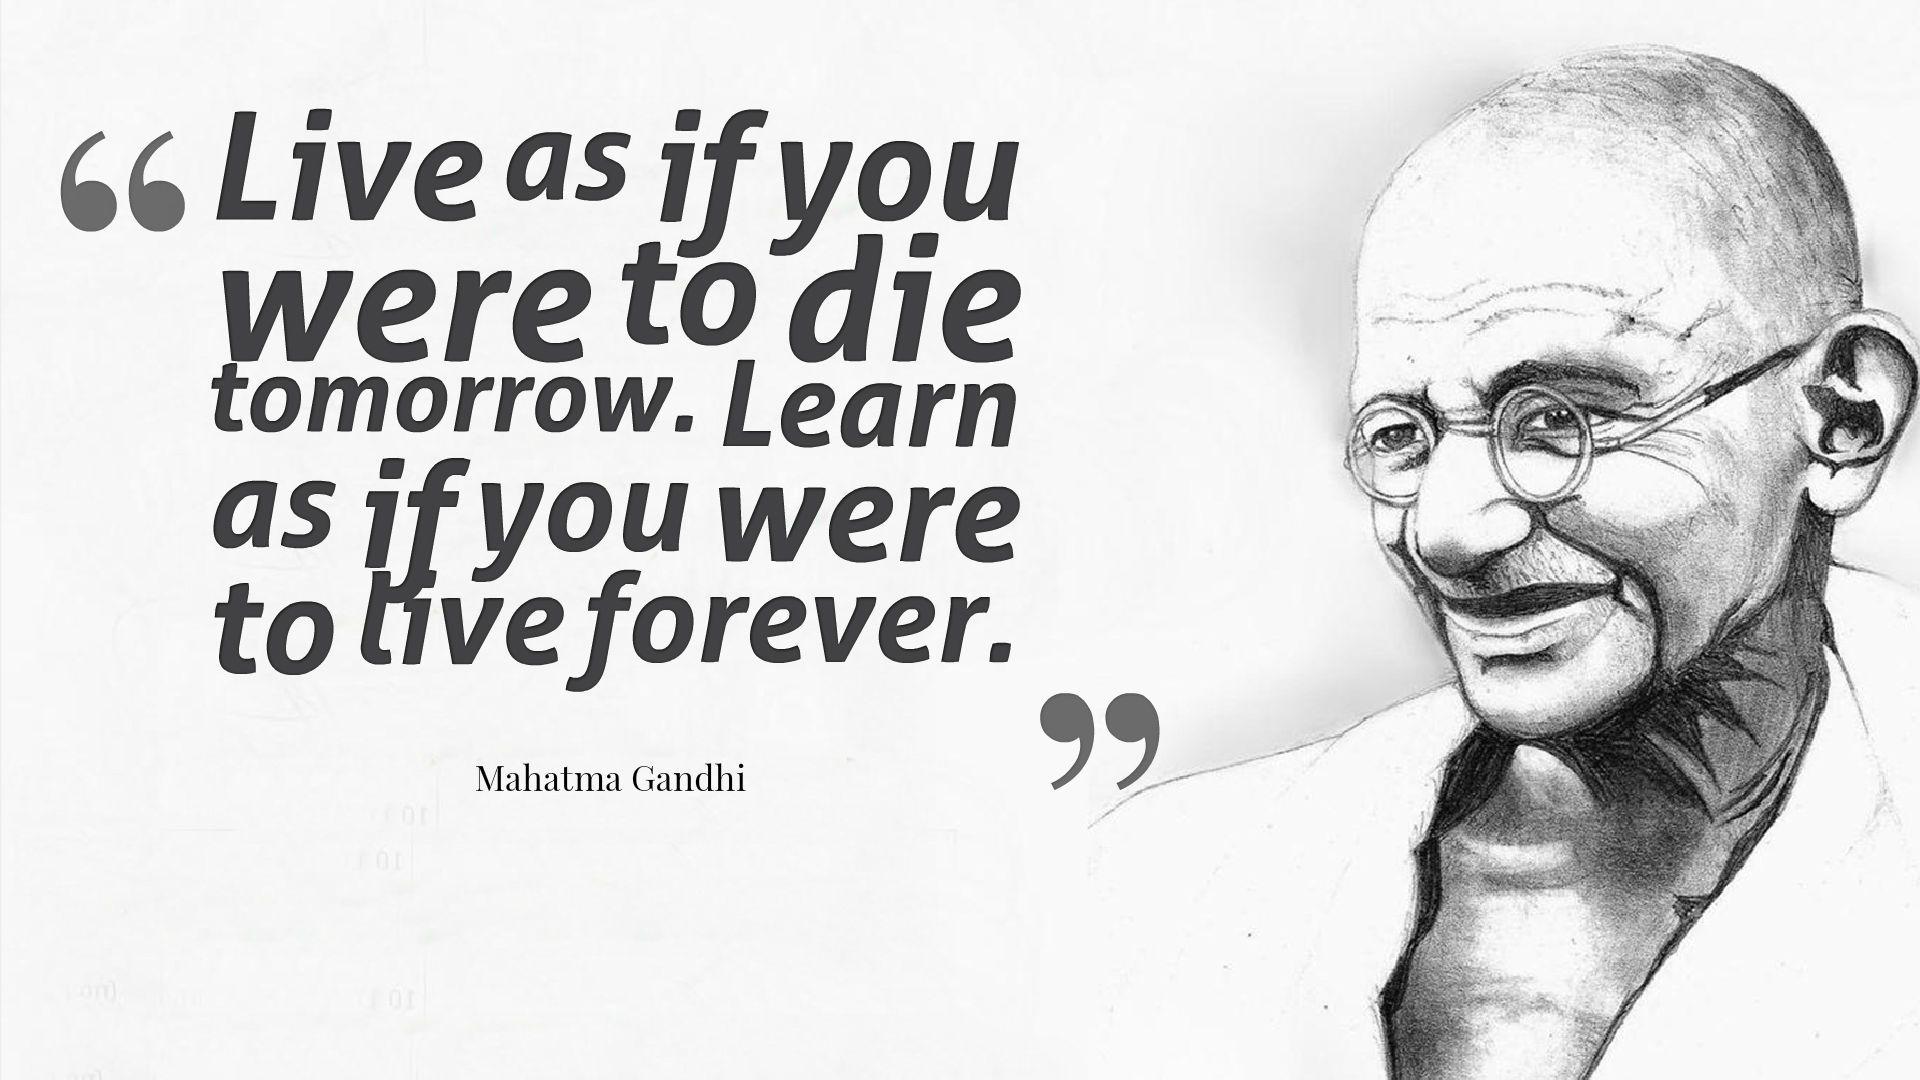 gandhi quotes wallpaper - photo #18